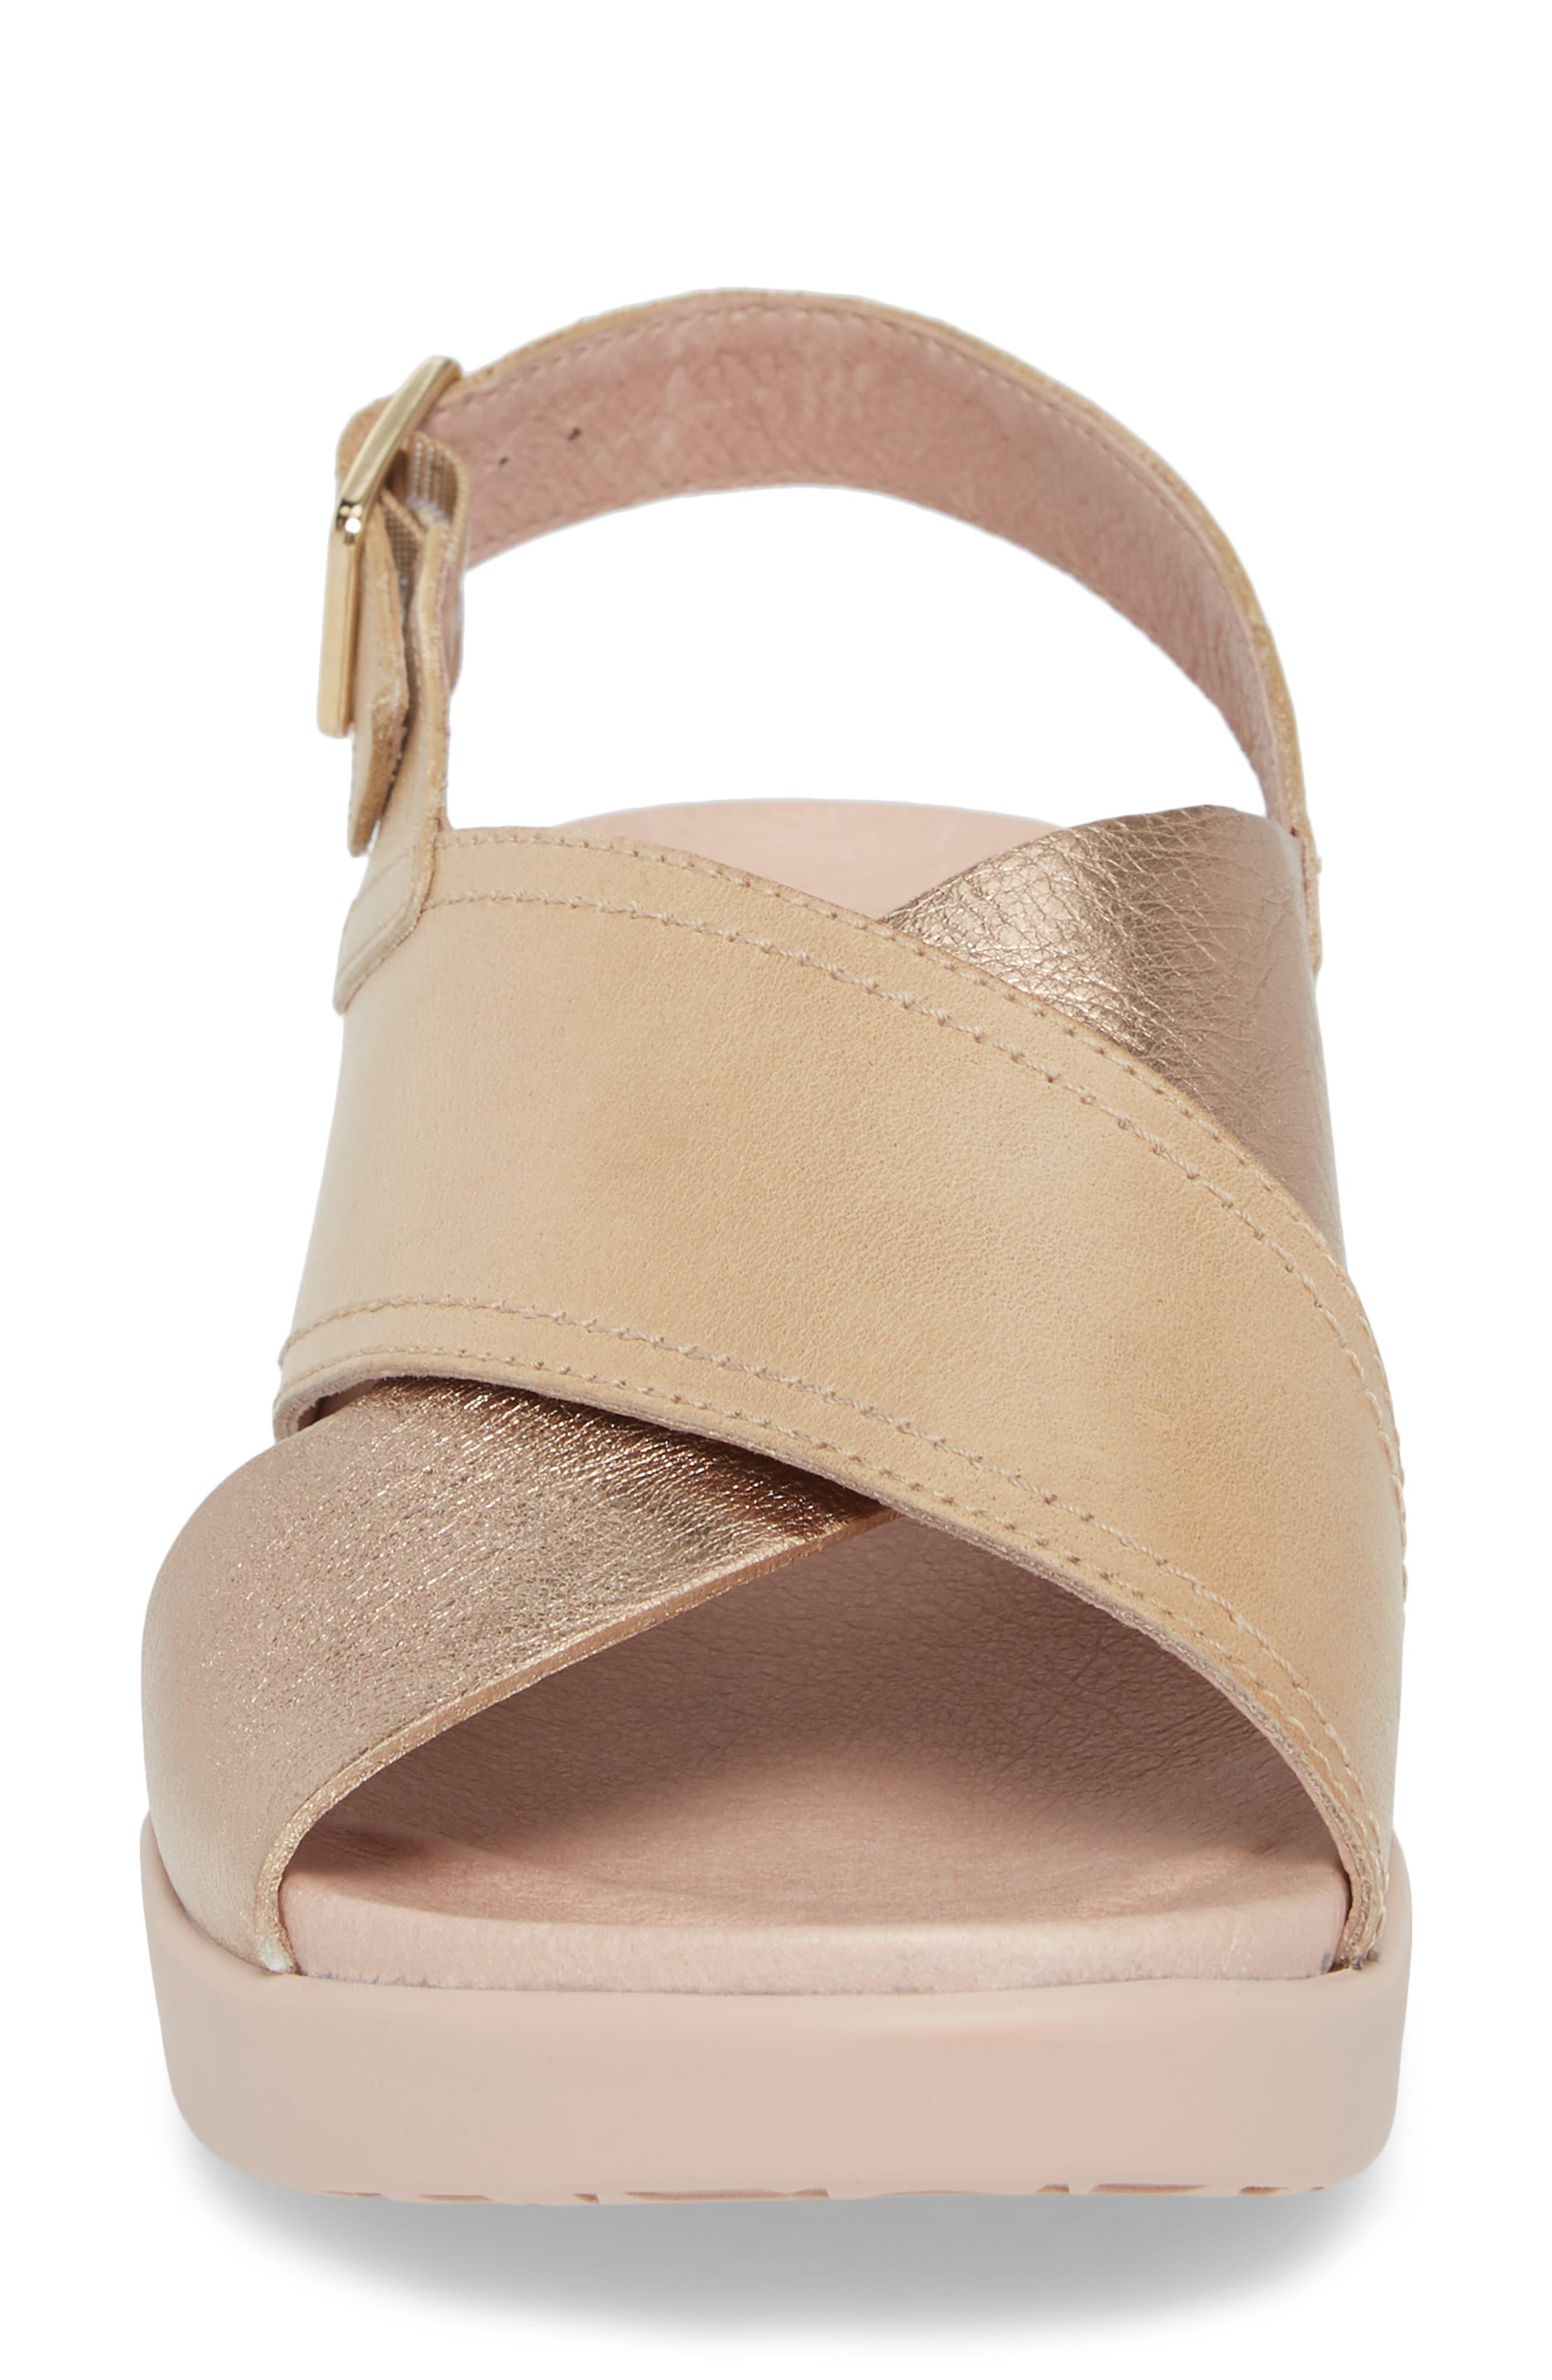 Platform Wedge Sandal,                             Alternate thumbnail 4, color,                             Oro/ Taupe Leather